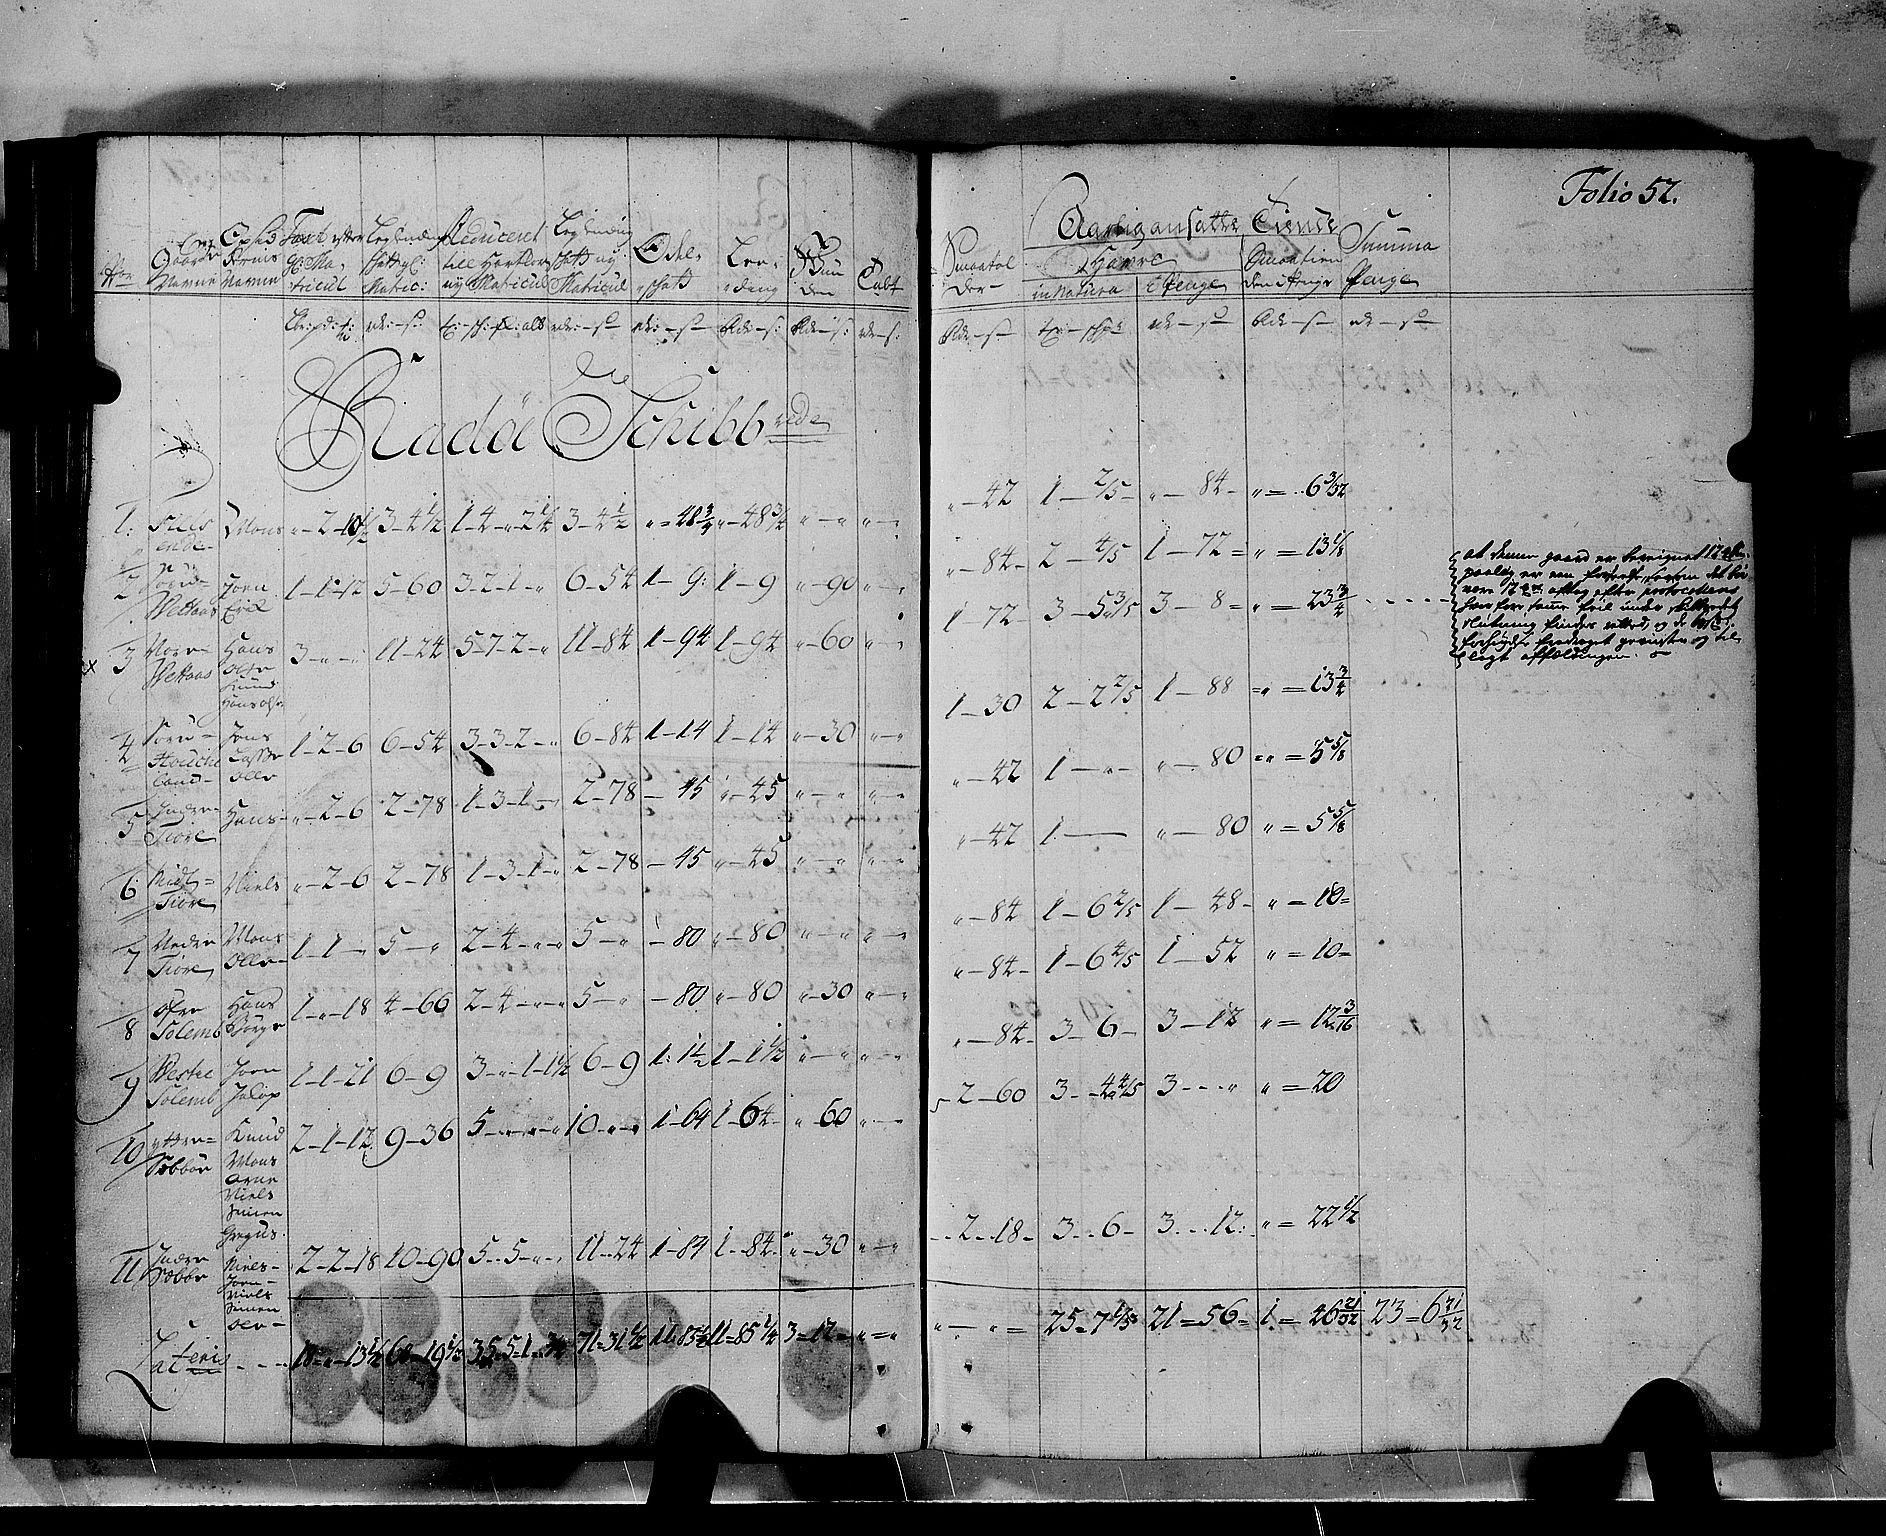 RA, Rentekammeret inntil 1814, Realistisk ordnet avdeling, N/Nb/Nbf/L0140: Nordhordland matrikkelprotokoll, 1723, s. 51b-52a